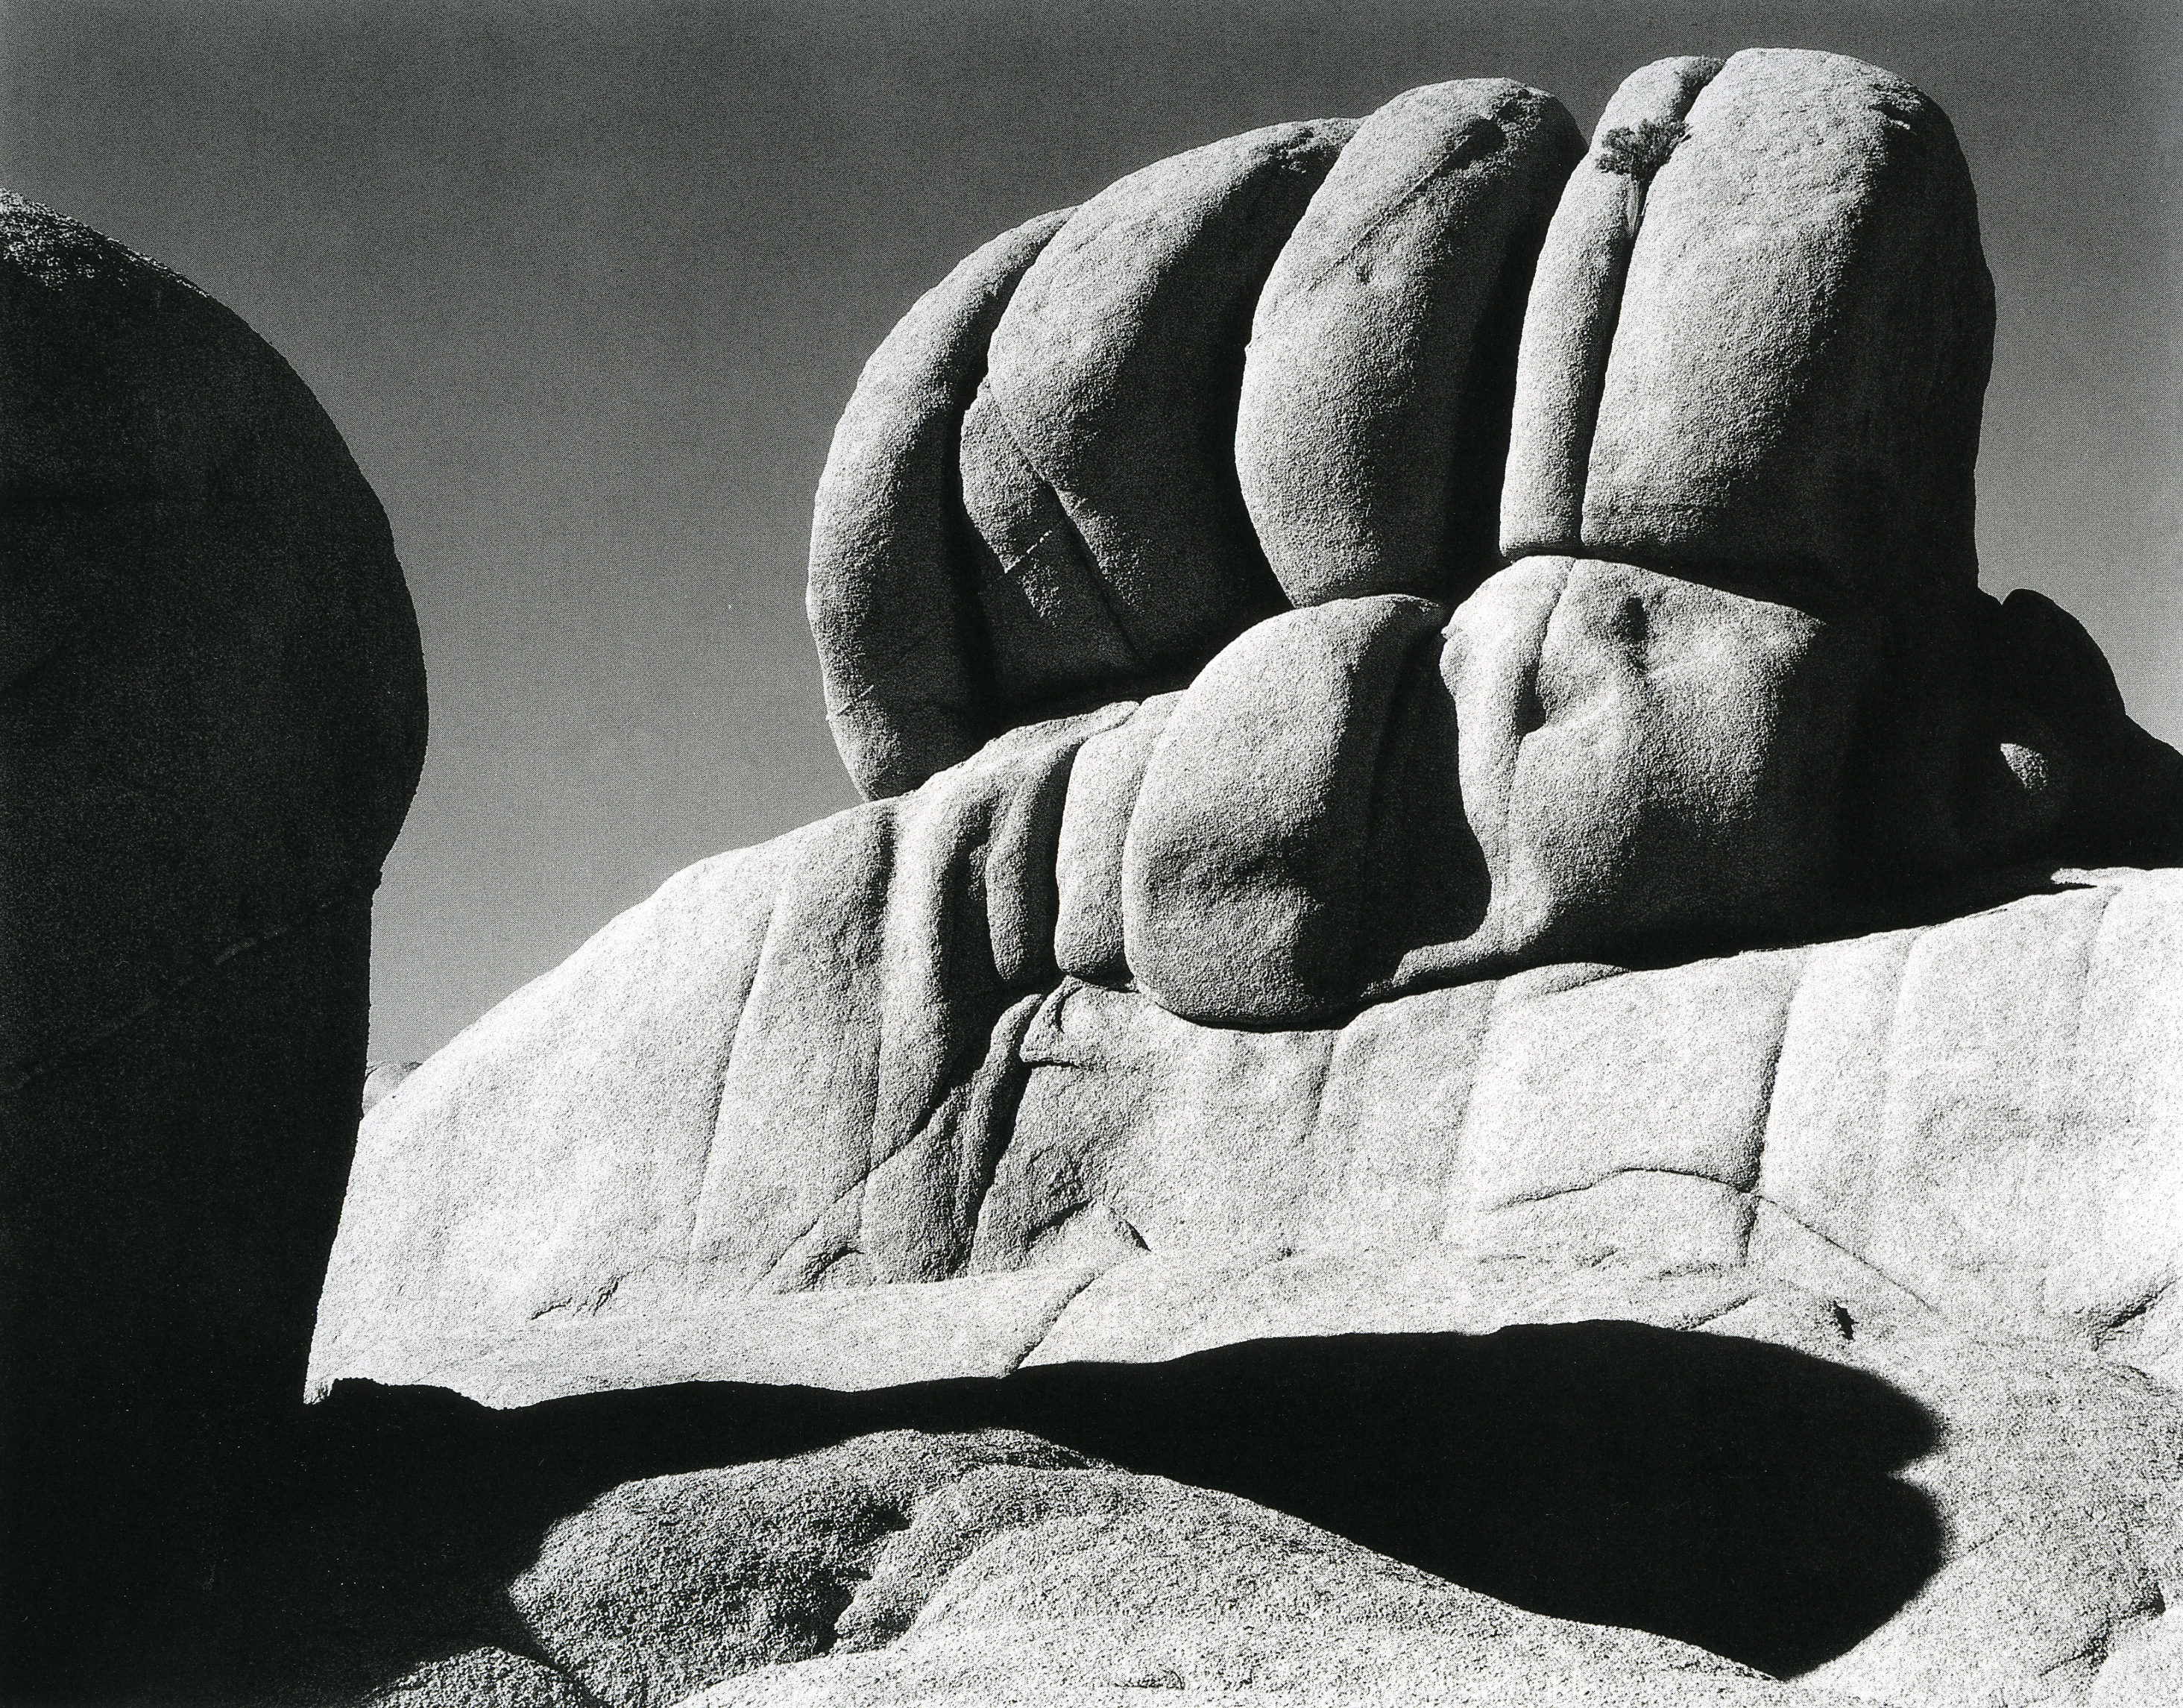 EW_Wonderland of Rokcs, 1937_p193